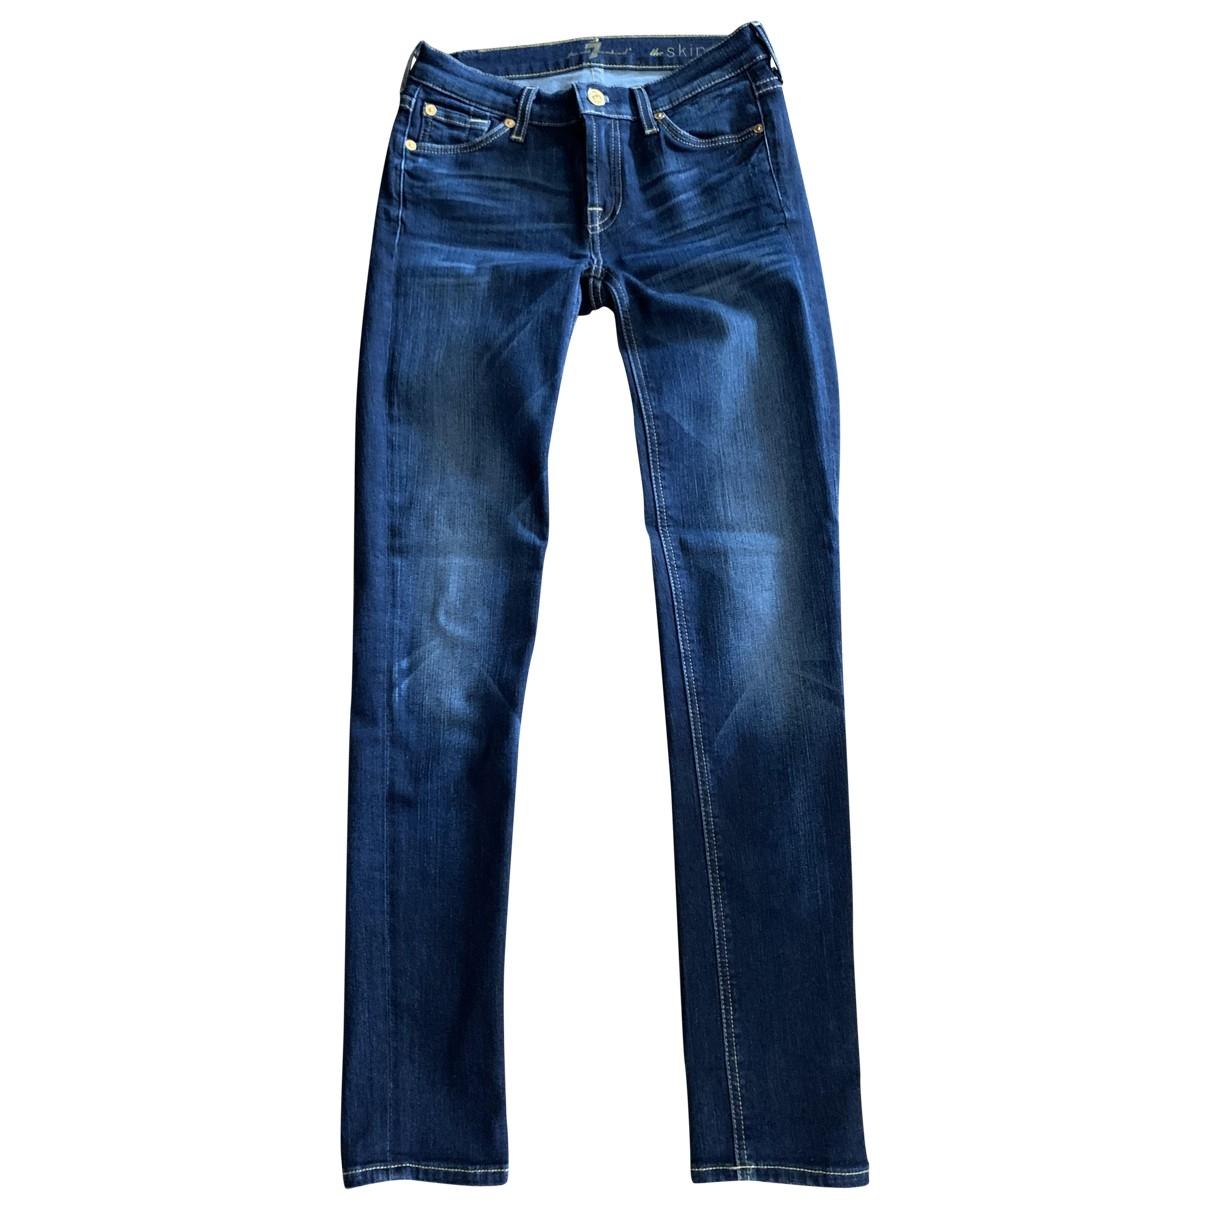 Seventh Wonderland \N Blue Denim - Jeans Jeans for Women 25 US